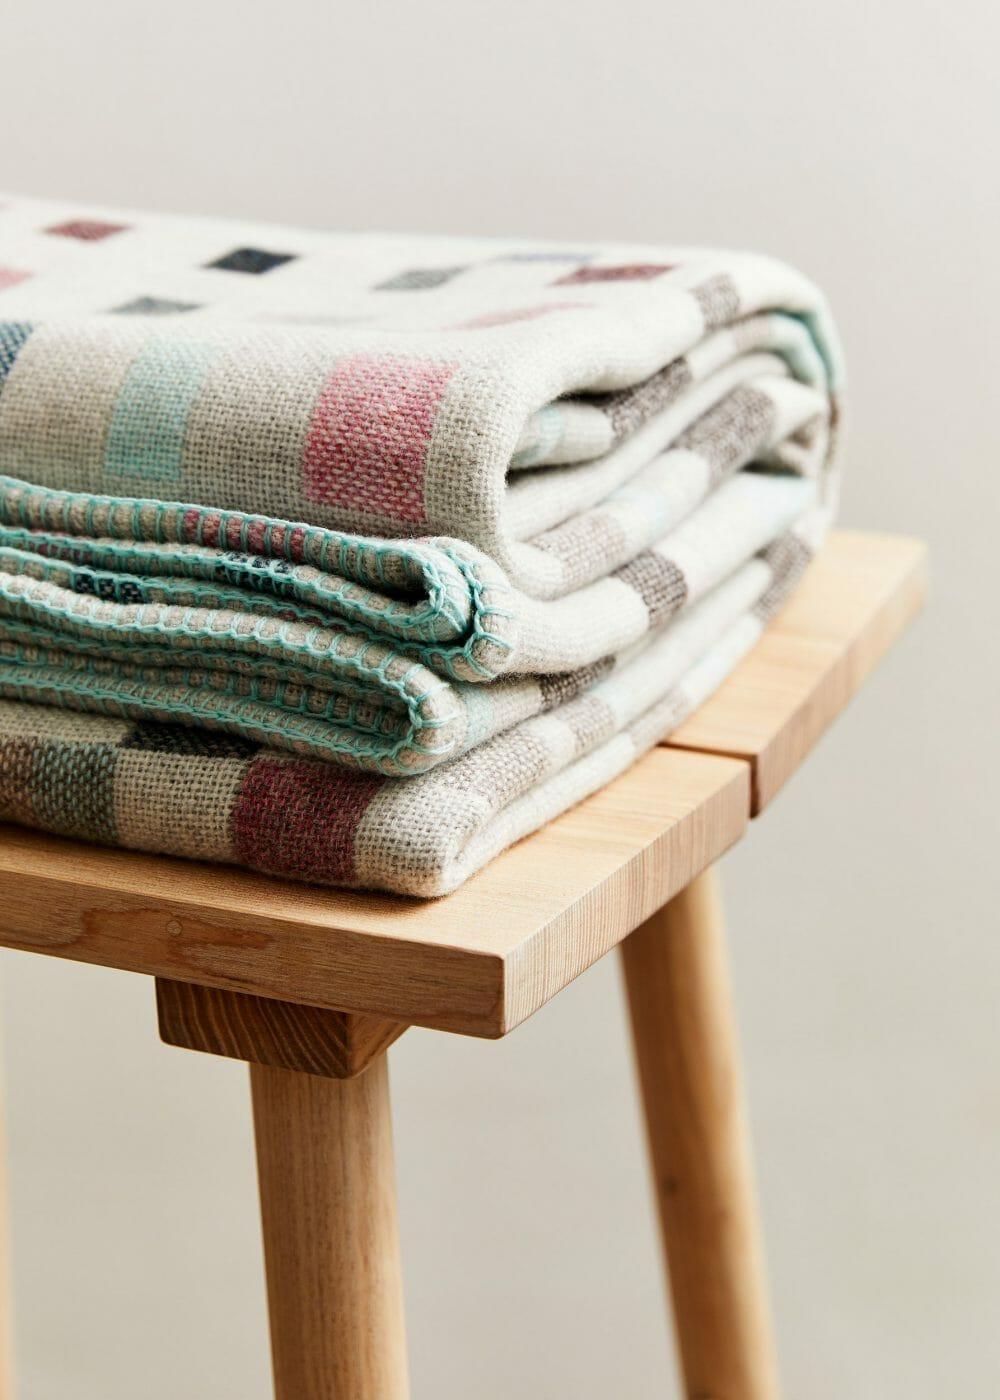 macaron-blanket-textiles-design-candleholder-books-shelving-furniture-design-homeware